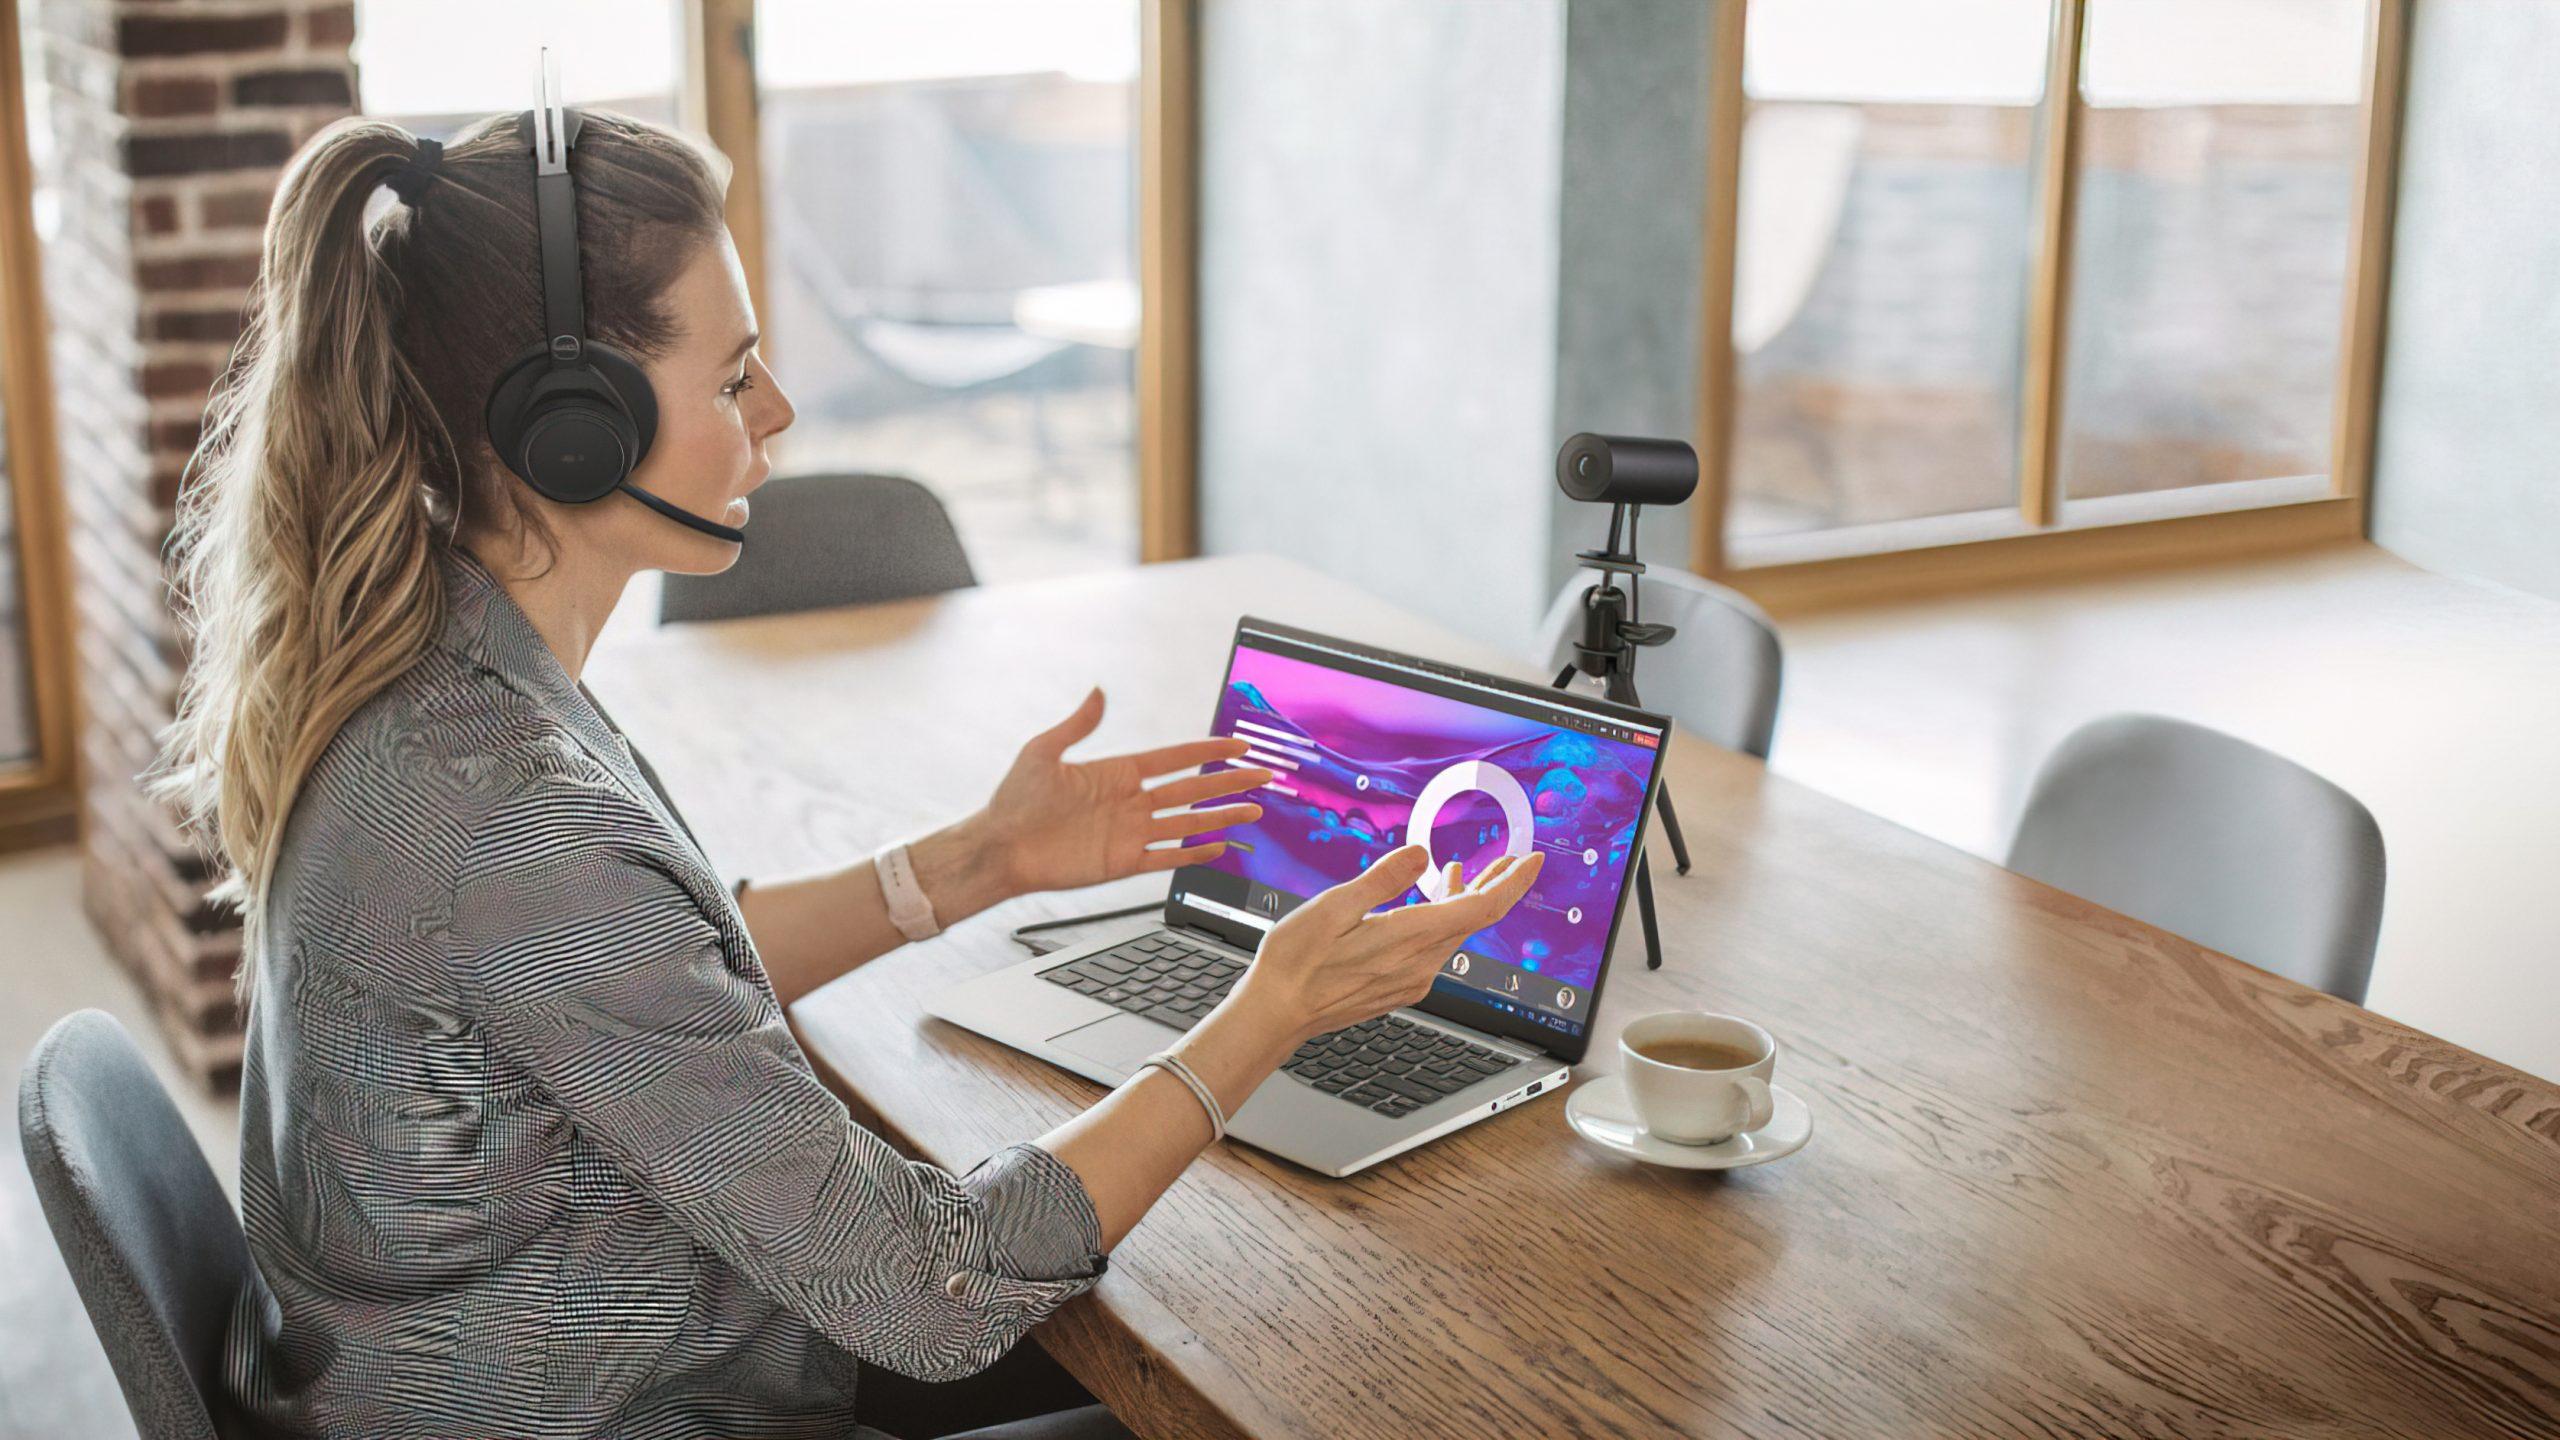 Dell UltraSharp Webcam lifestyle